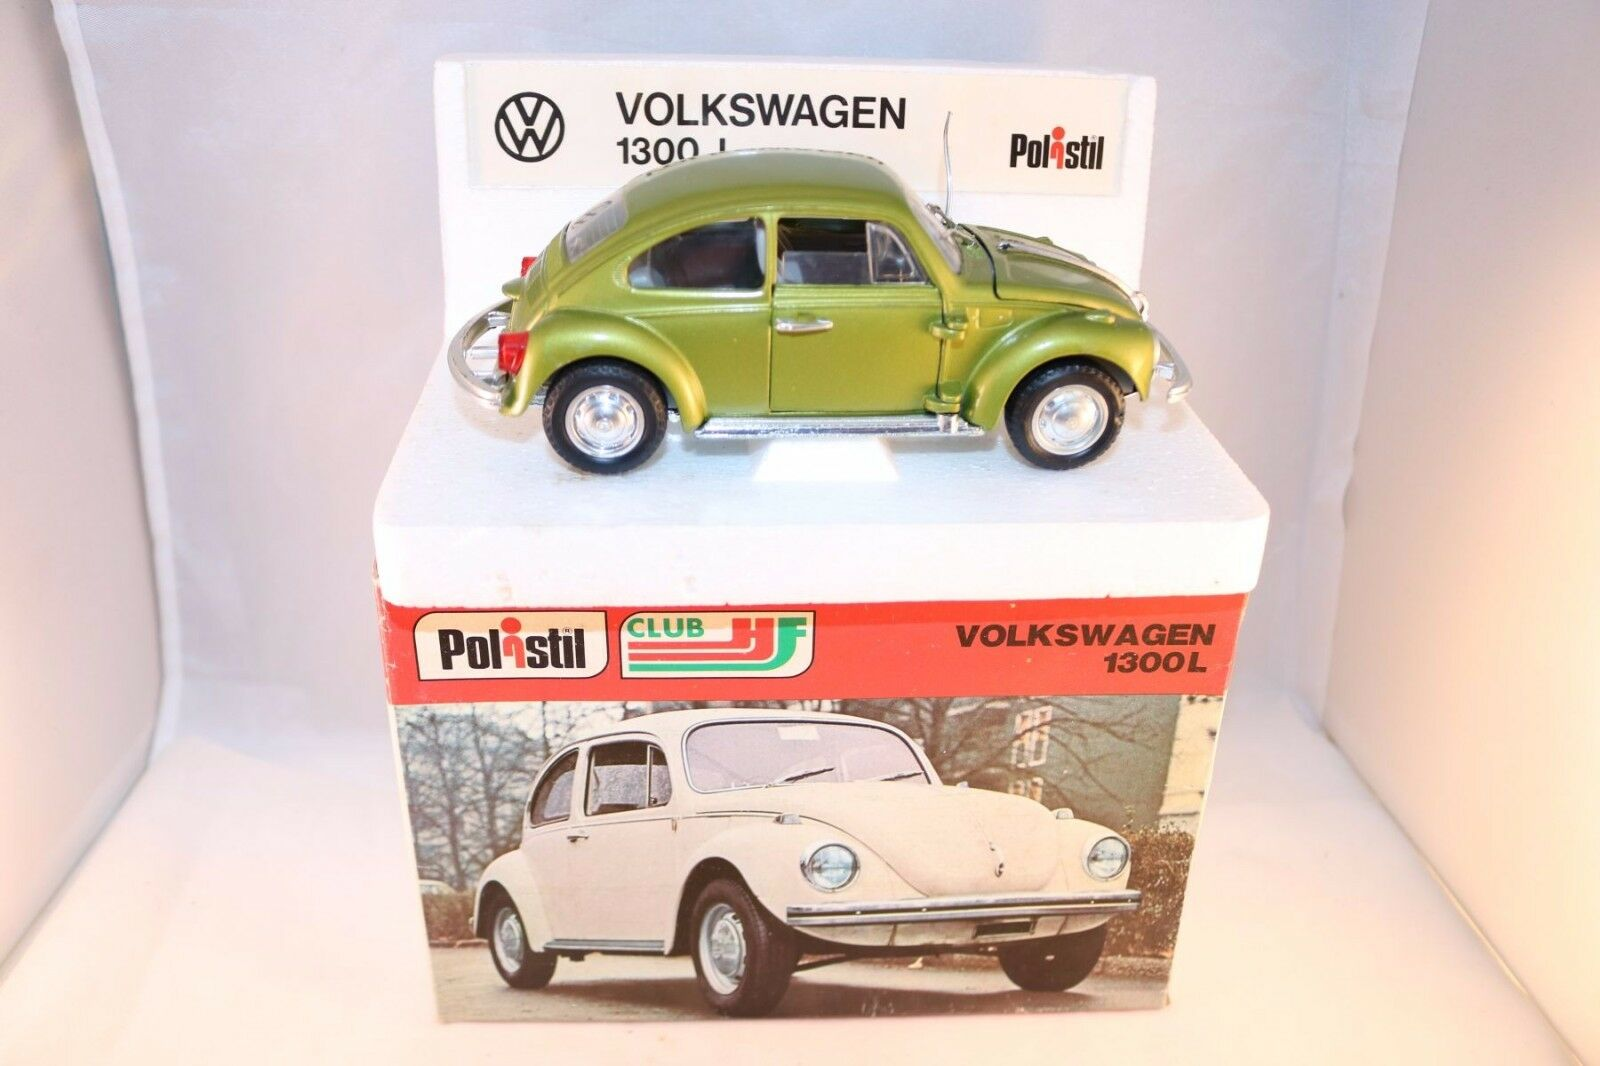 Polistil S42 S 42 Volkswagen 1300L 99.9%  mint in box 1 25 selten raro rare